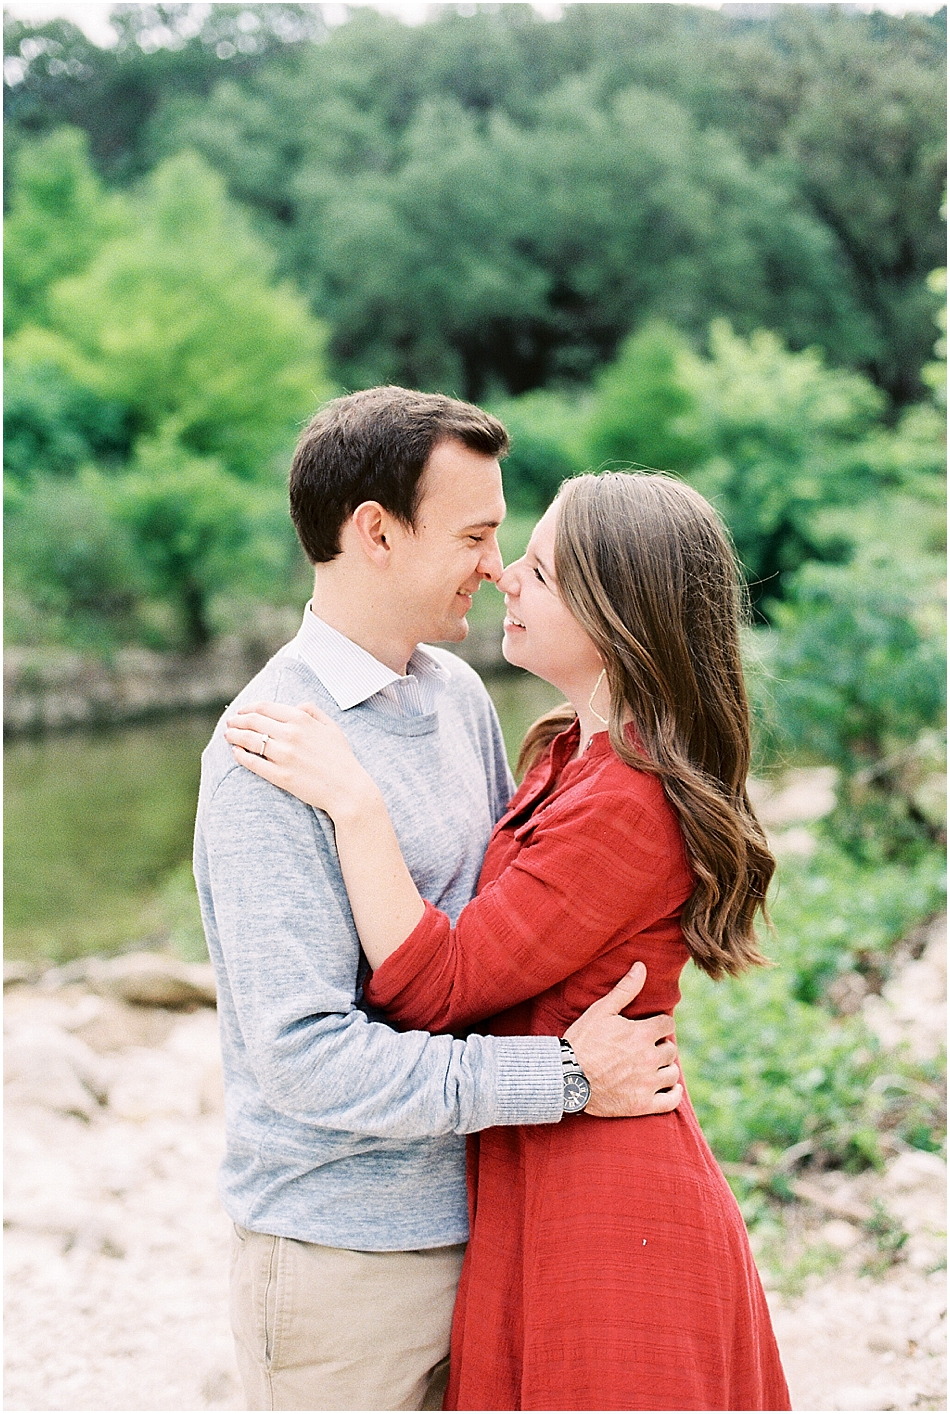 Laura + Nick | Engagement | Fine Art Film | Austin Texas | Emilie Anne Photography-36.jpg